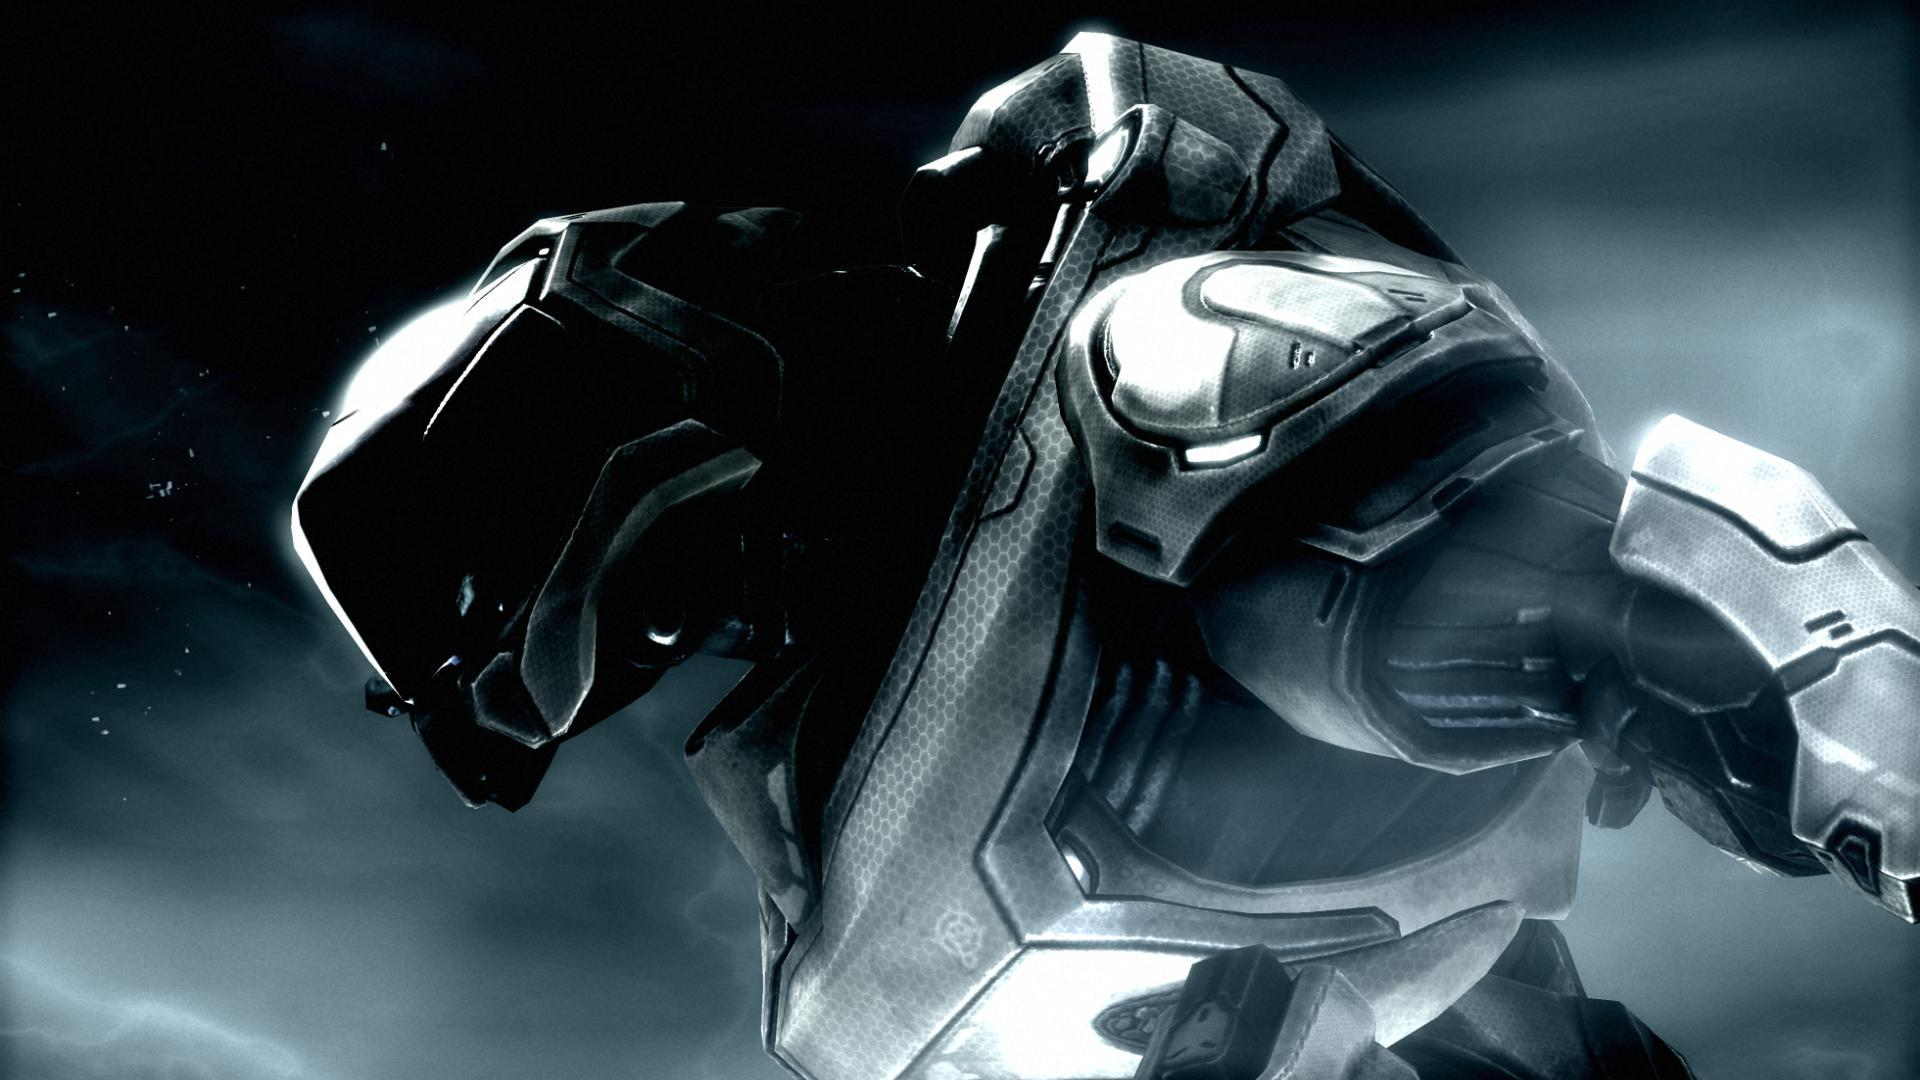 Halo 4 Elite Wallpapers Wallpaper Cave